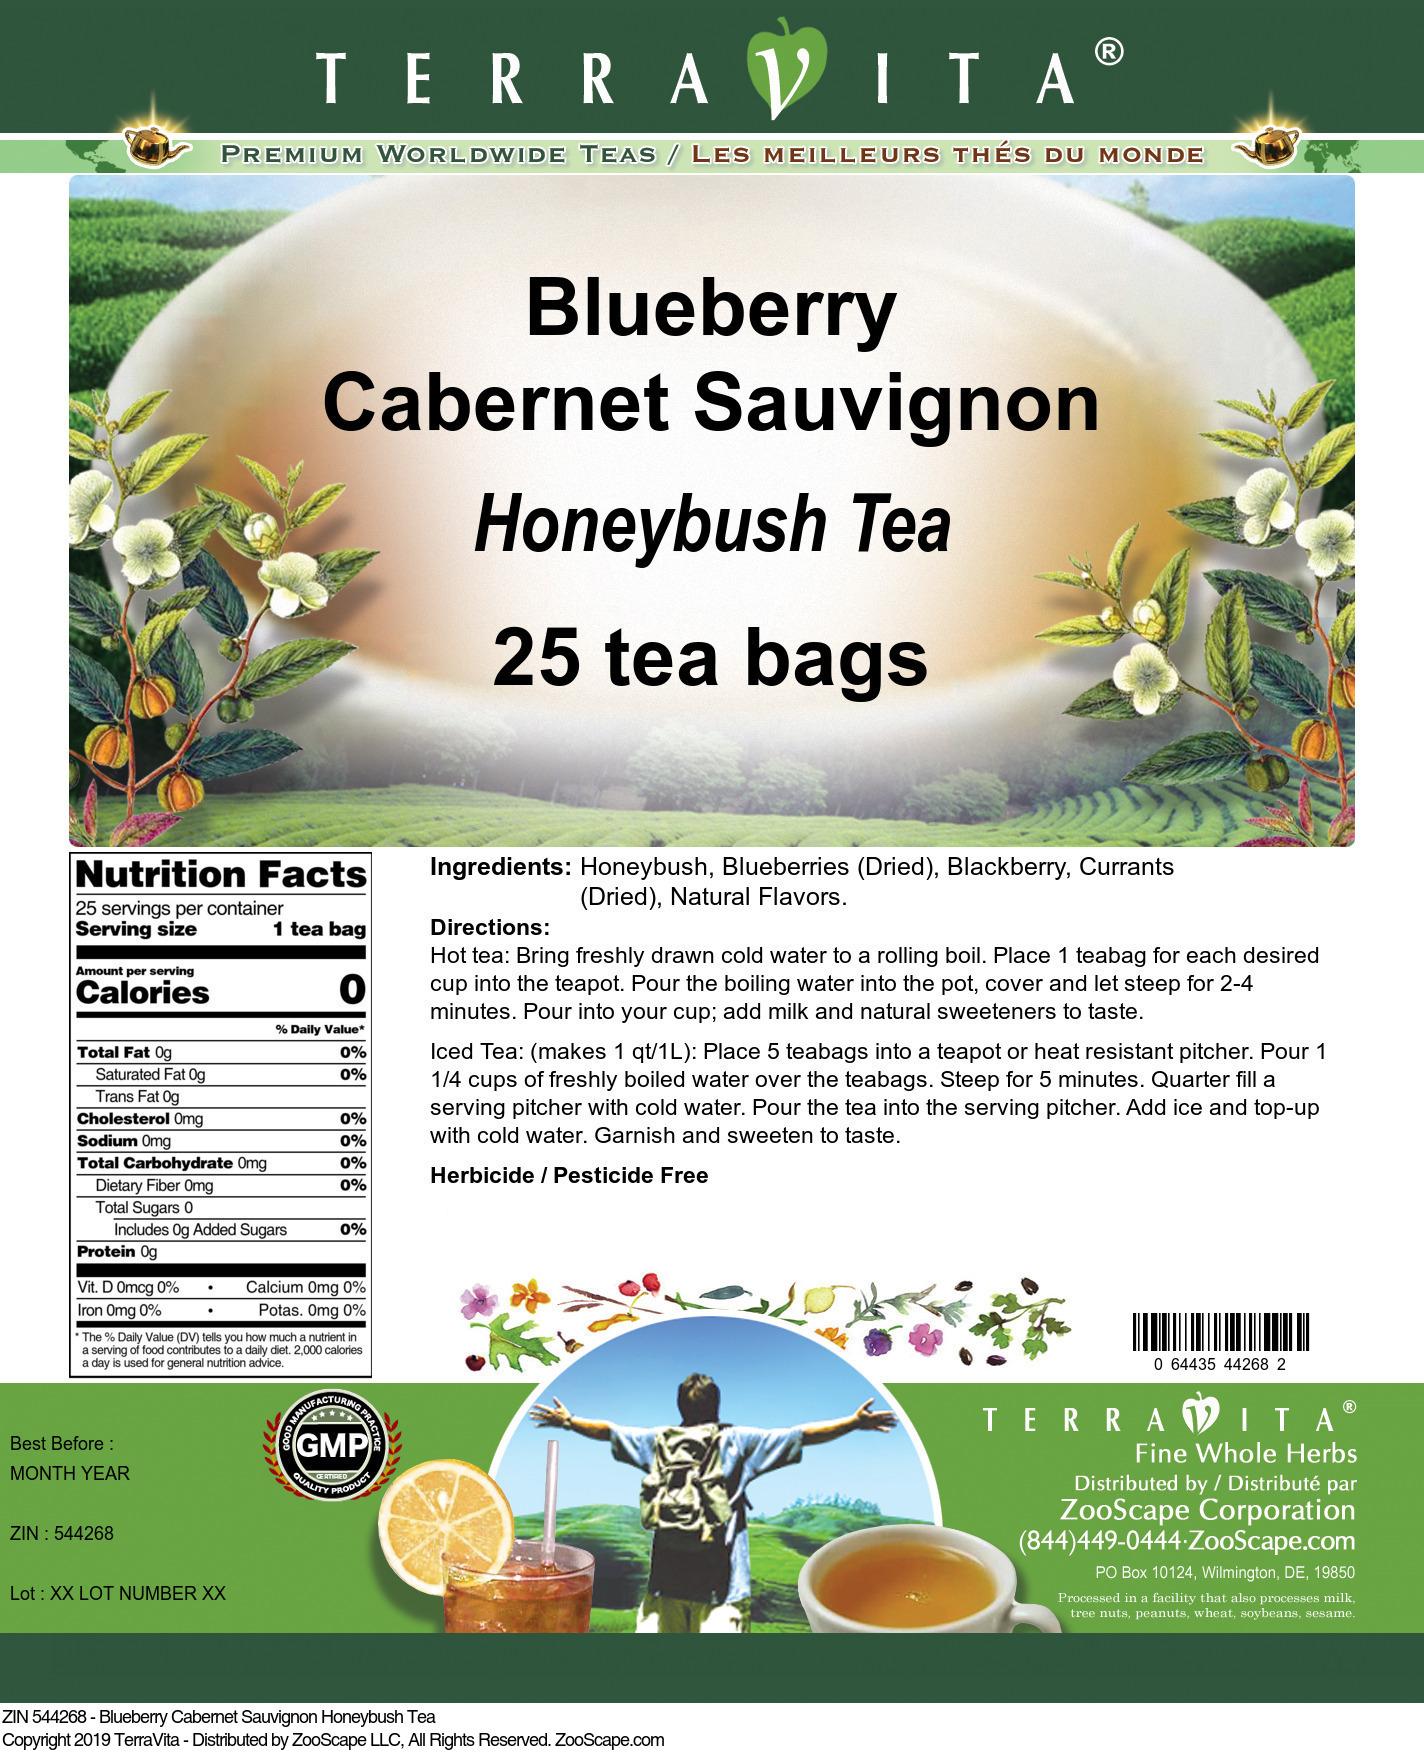 Blueberry Cabernet Sauvignon Honeybush Tea